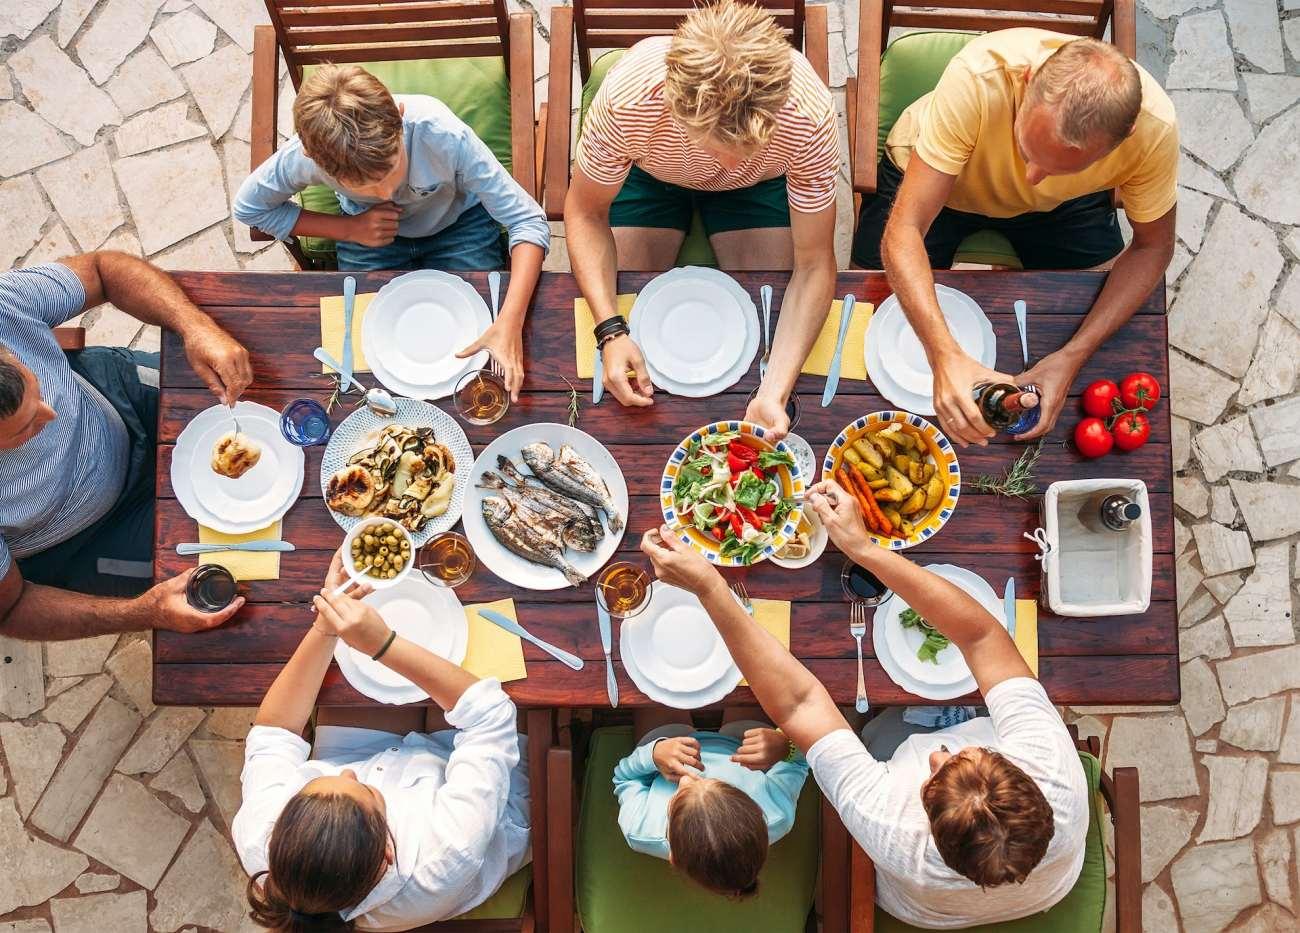 Una famiglia seduta a tavola a mangiare.